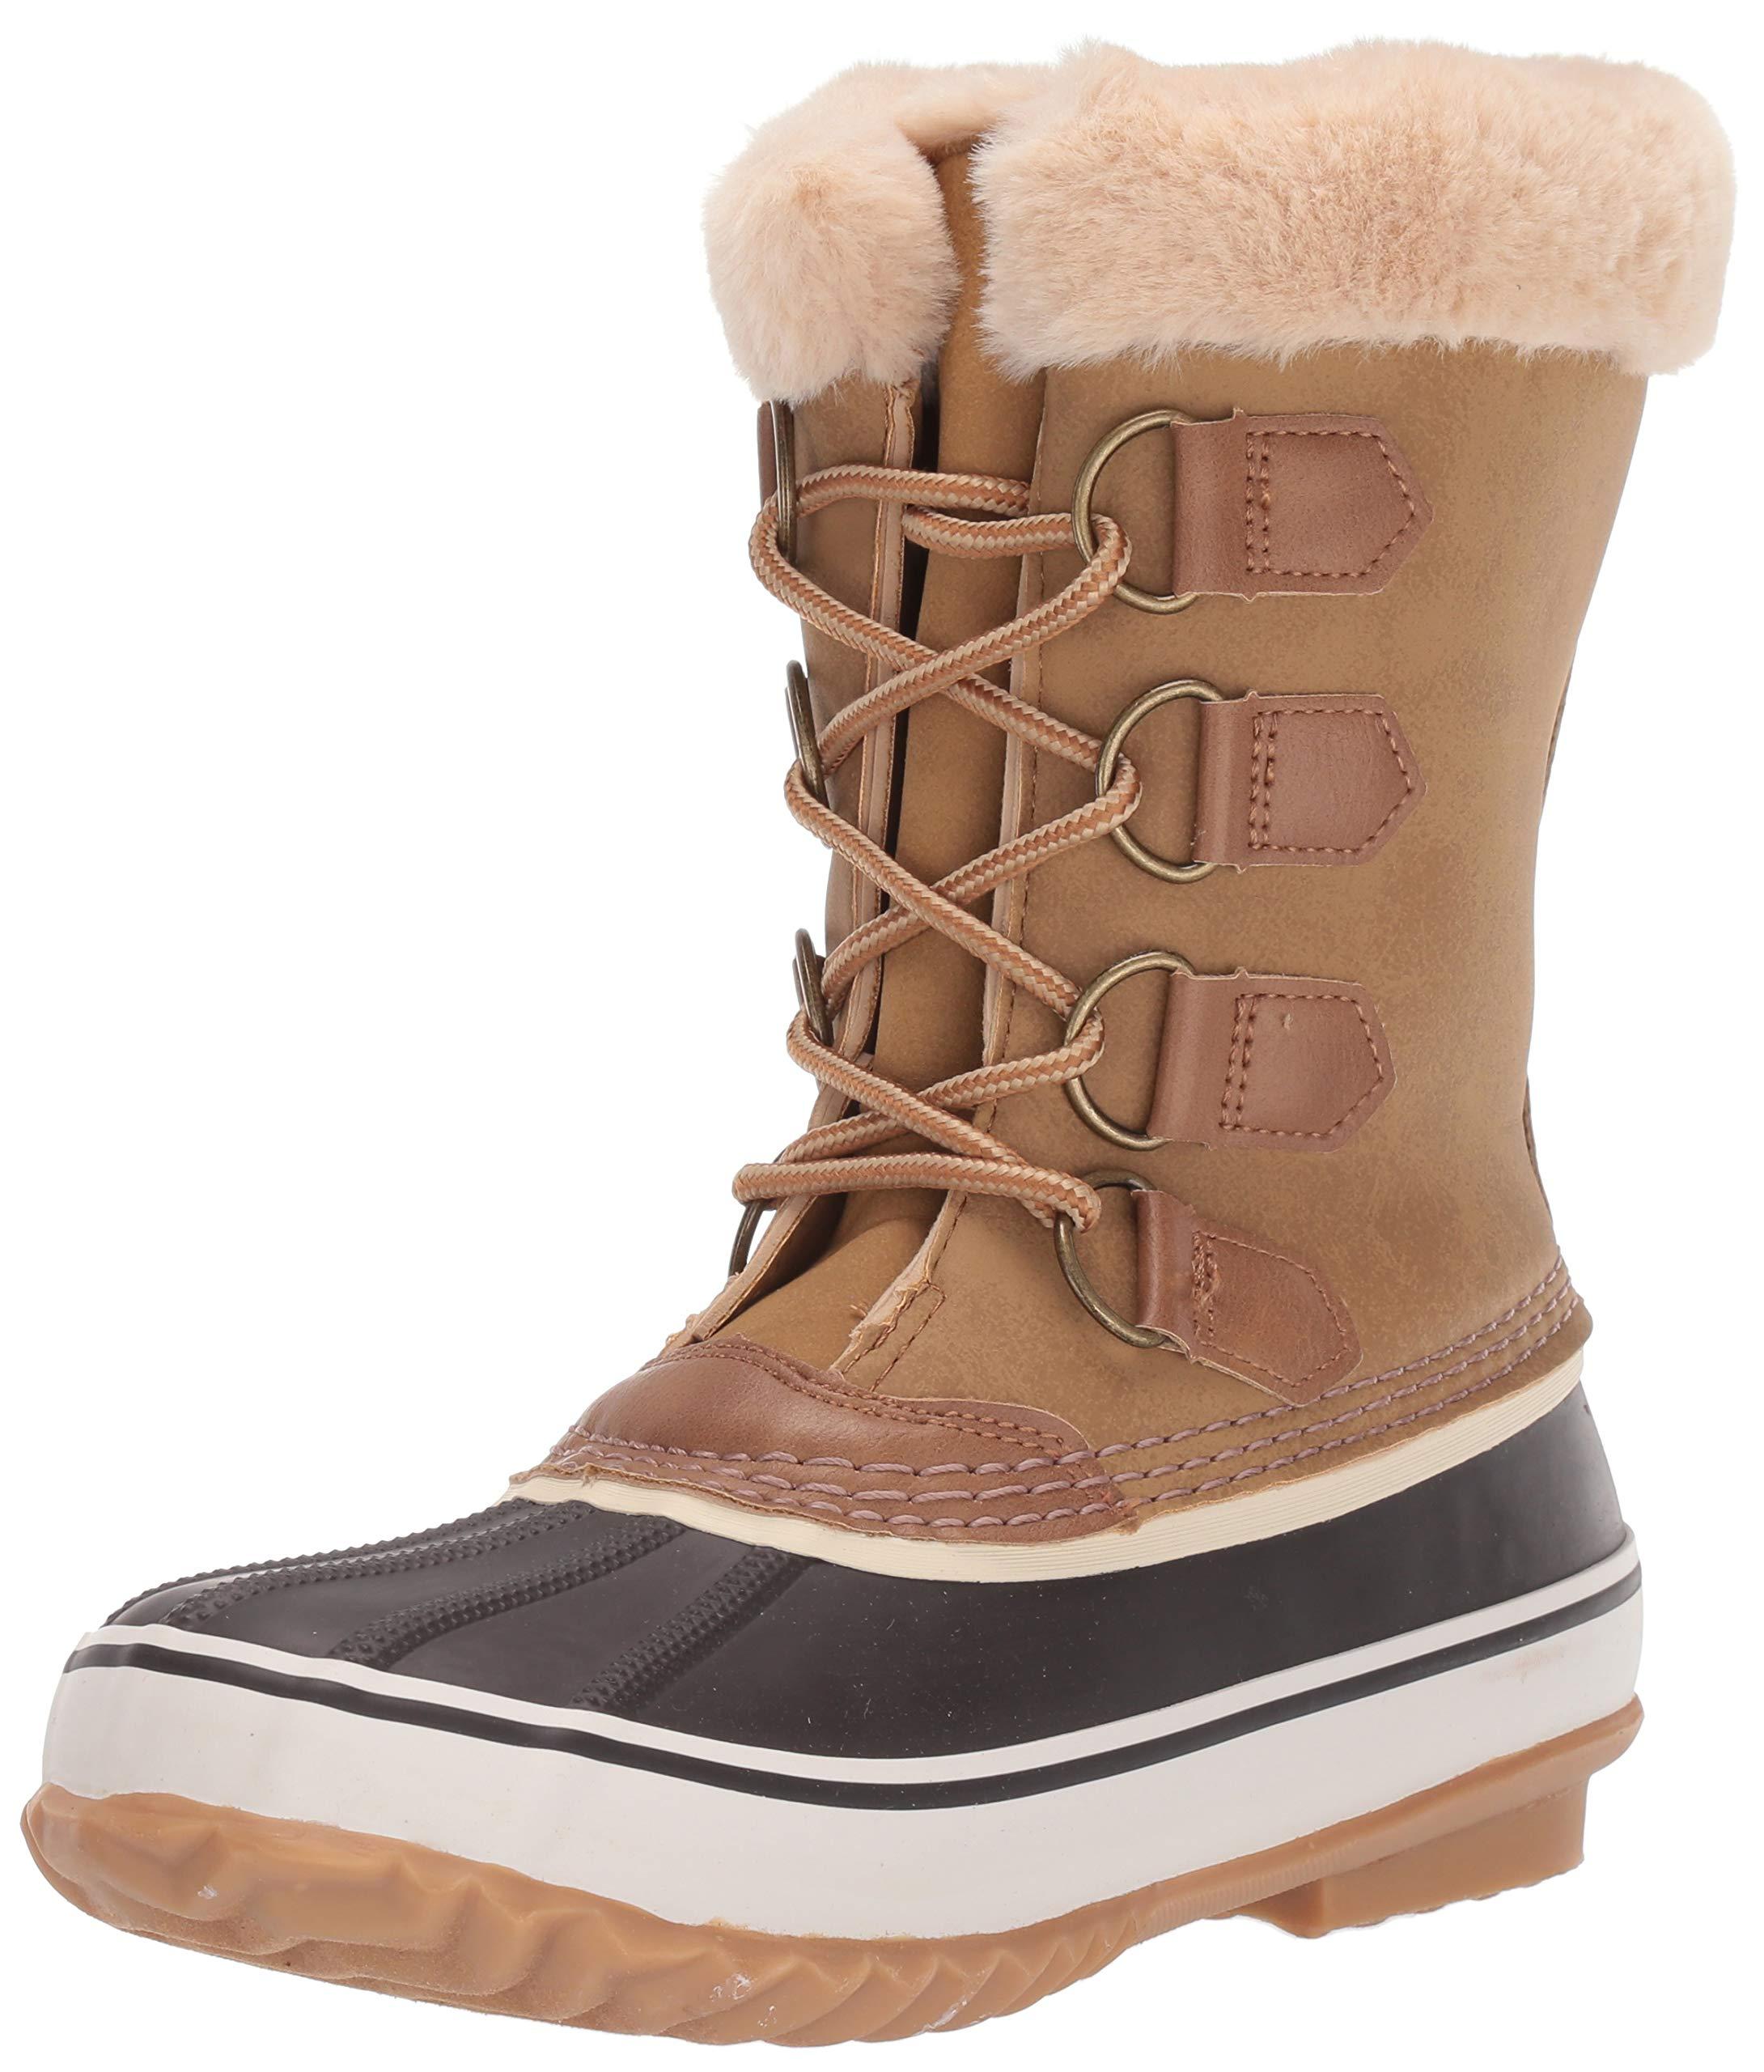 JBU by Jambu Women's Rainey Weather Ready Snow Boot